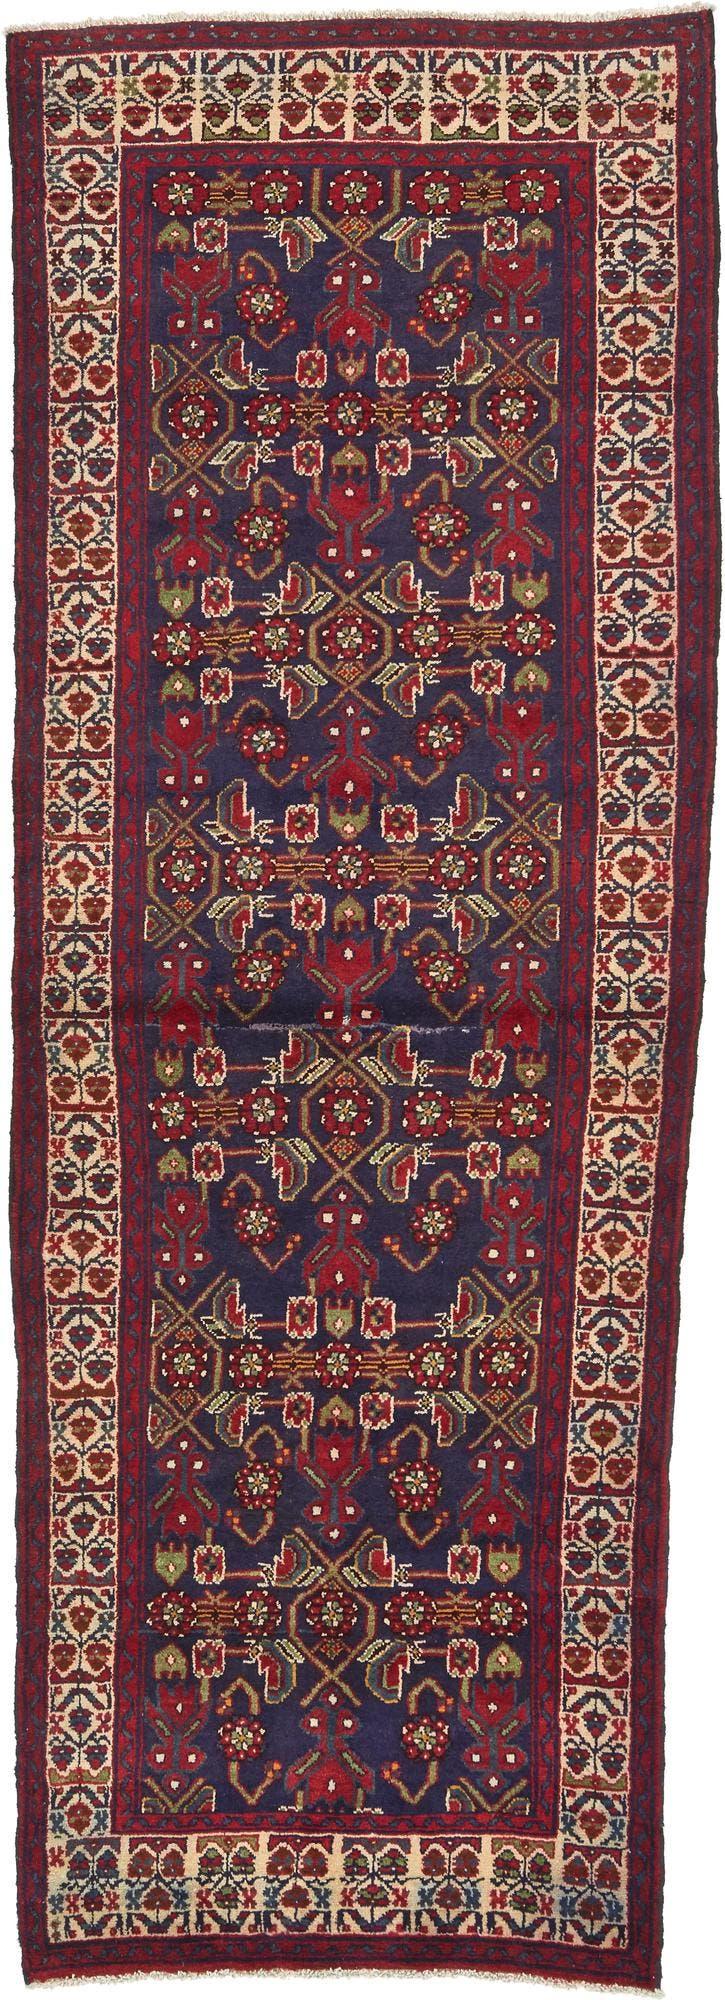 3' 6 x 9' 9 Malayer Persian Runner Rug main image